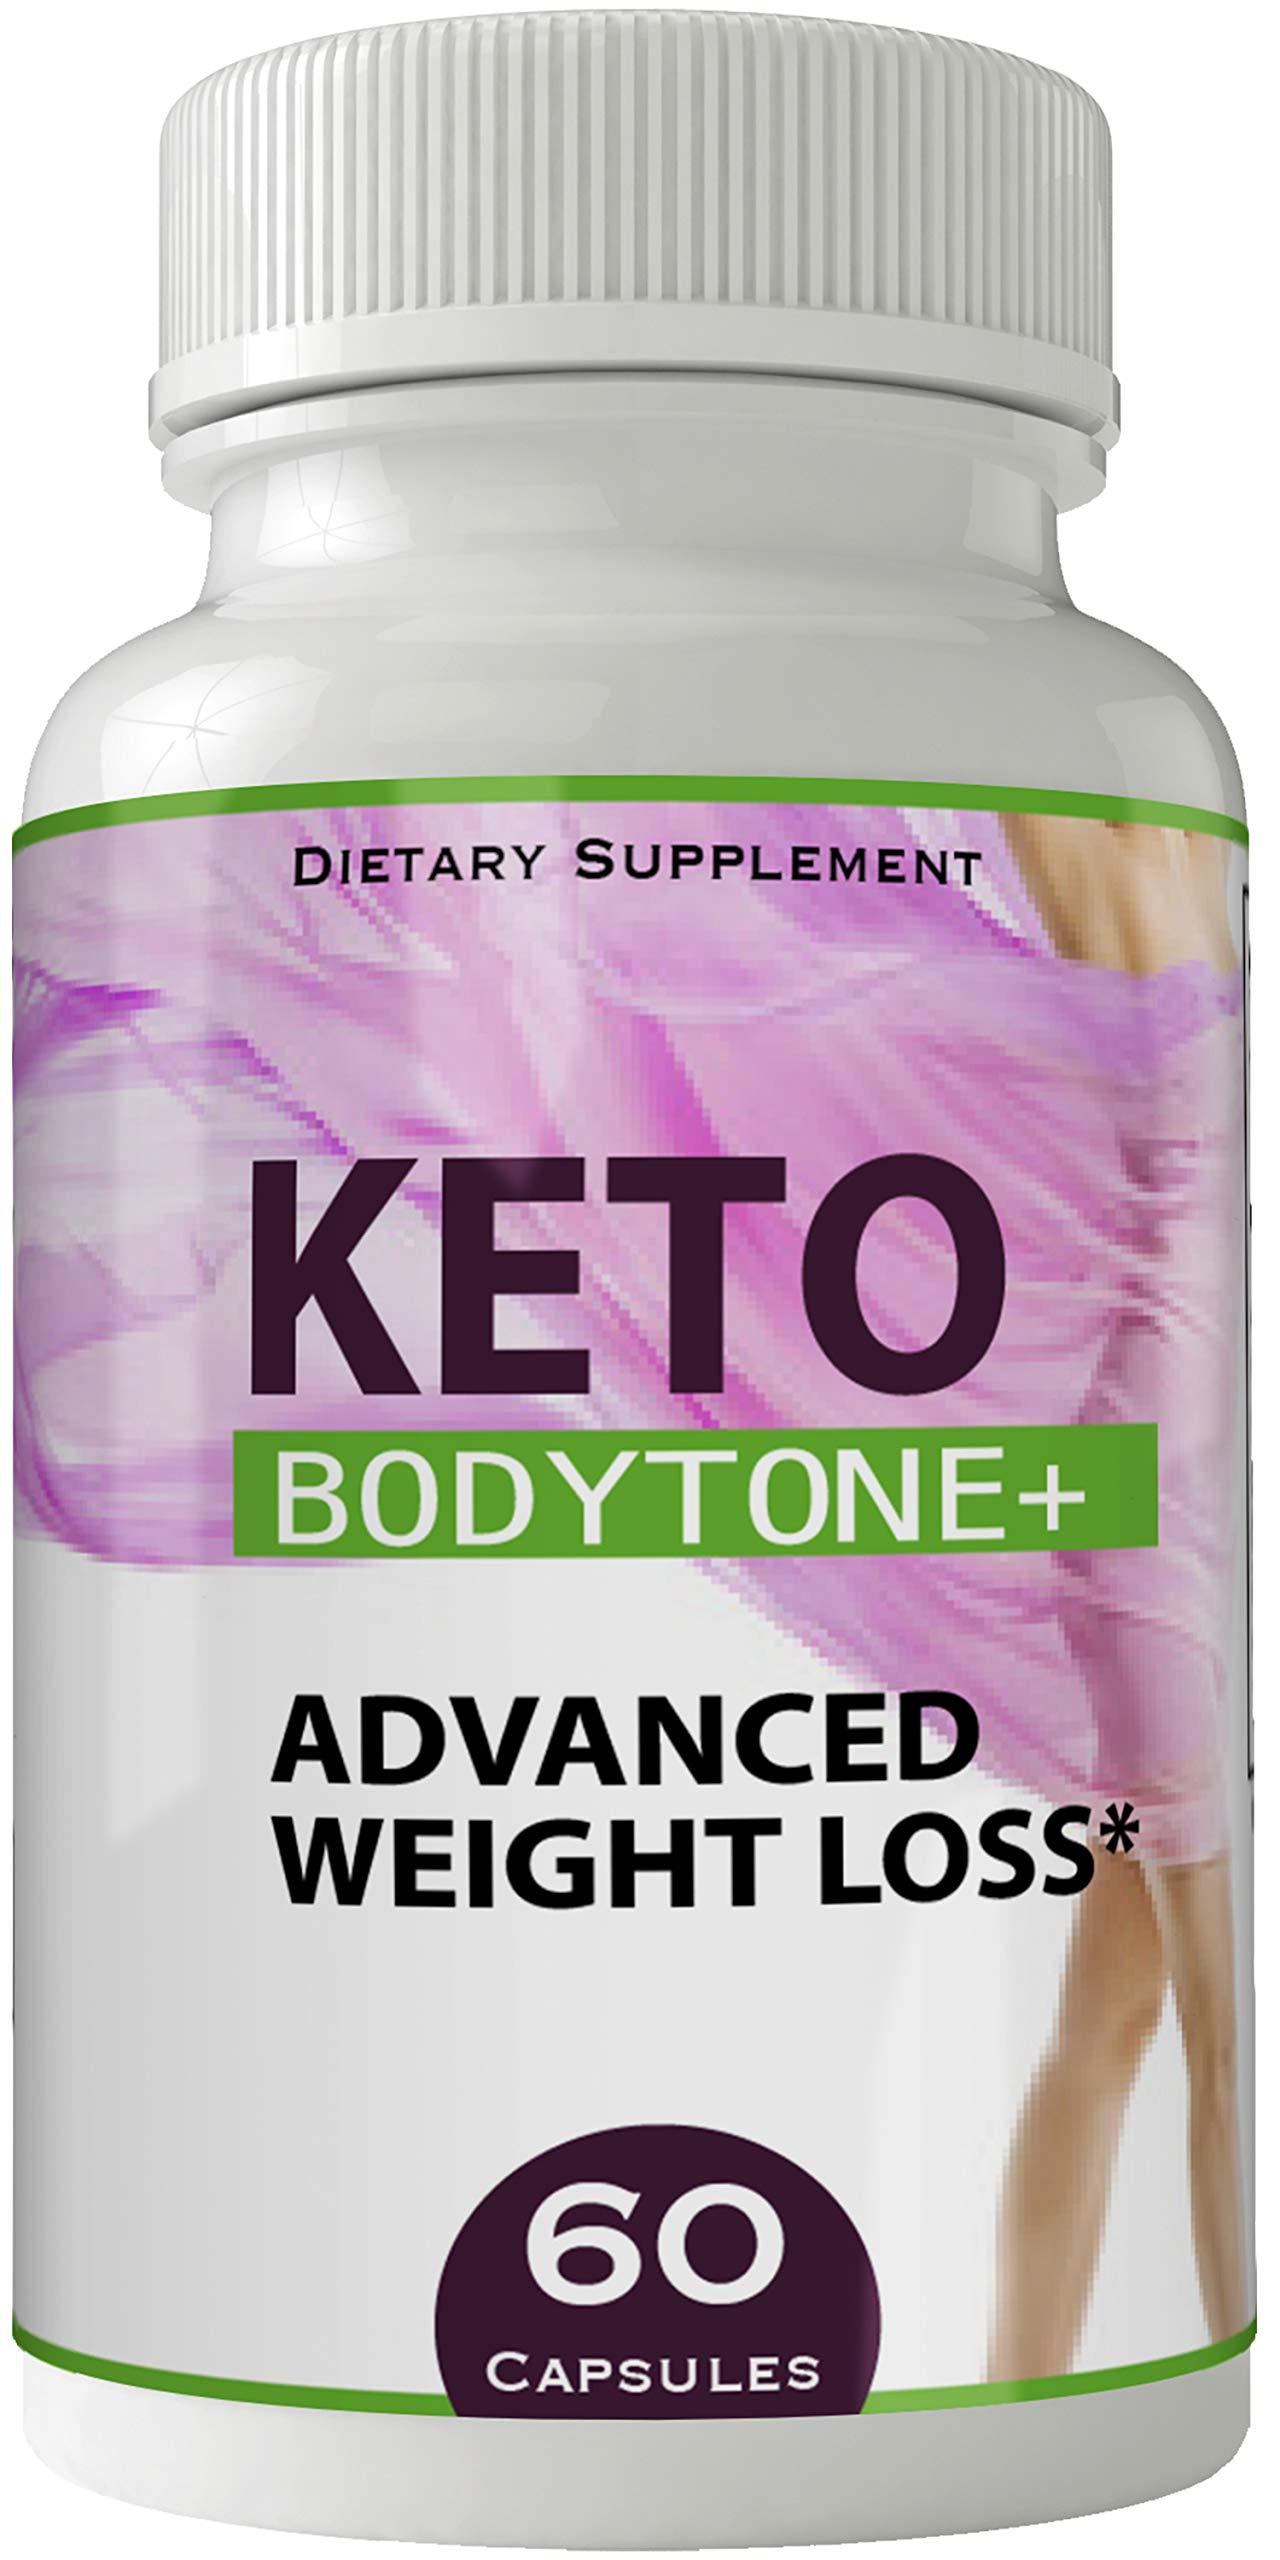 Keto Bodytone Plus Advanced Natural Ketogenic Body Tone Weight Loss Pills, BHB Burn Fat Supplement, 800 mg Formula with New True Slim GO BHB Salts Formula, Advanced Appetite Suppressant Capsules ...